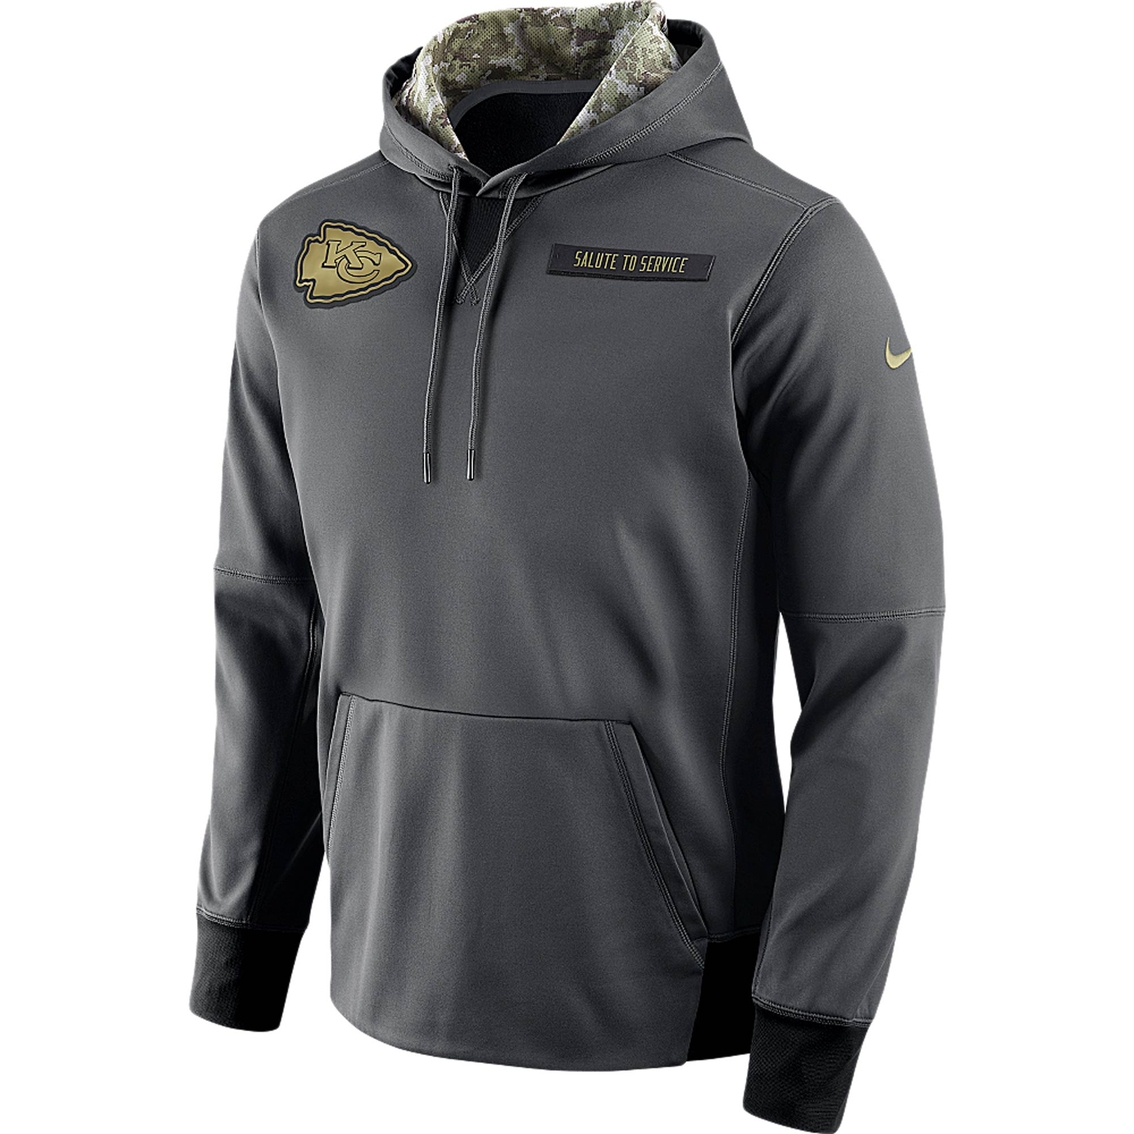 Chiefs hoodies